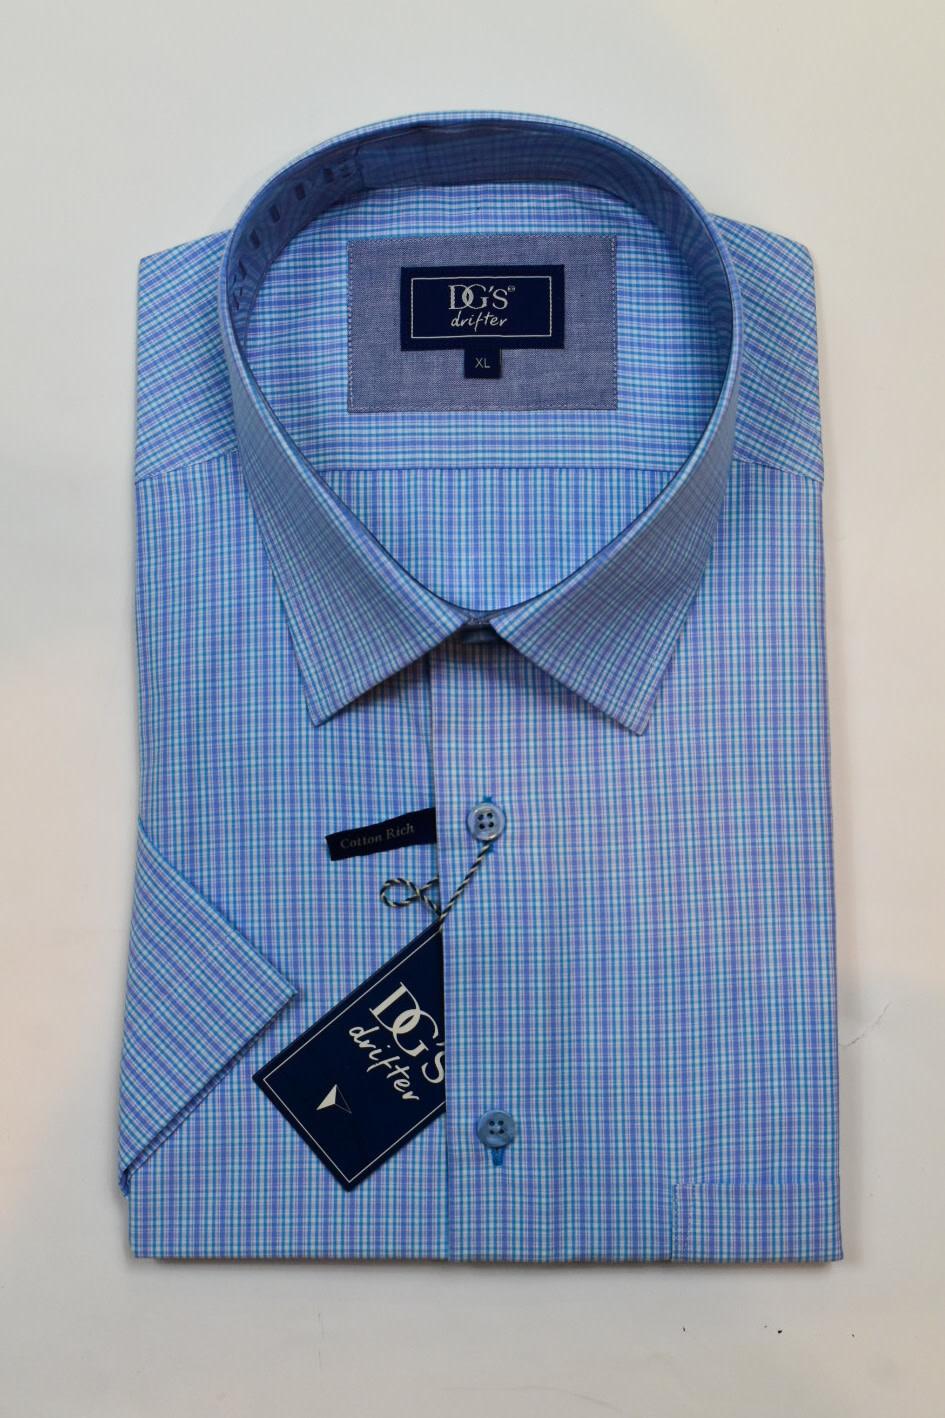 daniel grahame Dg15583, ivano, short sleeve shirt